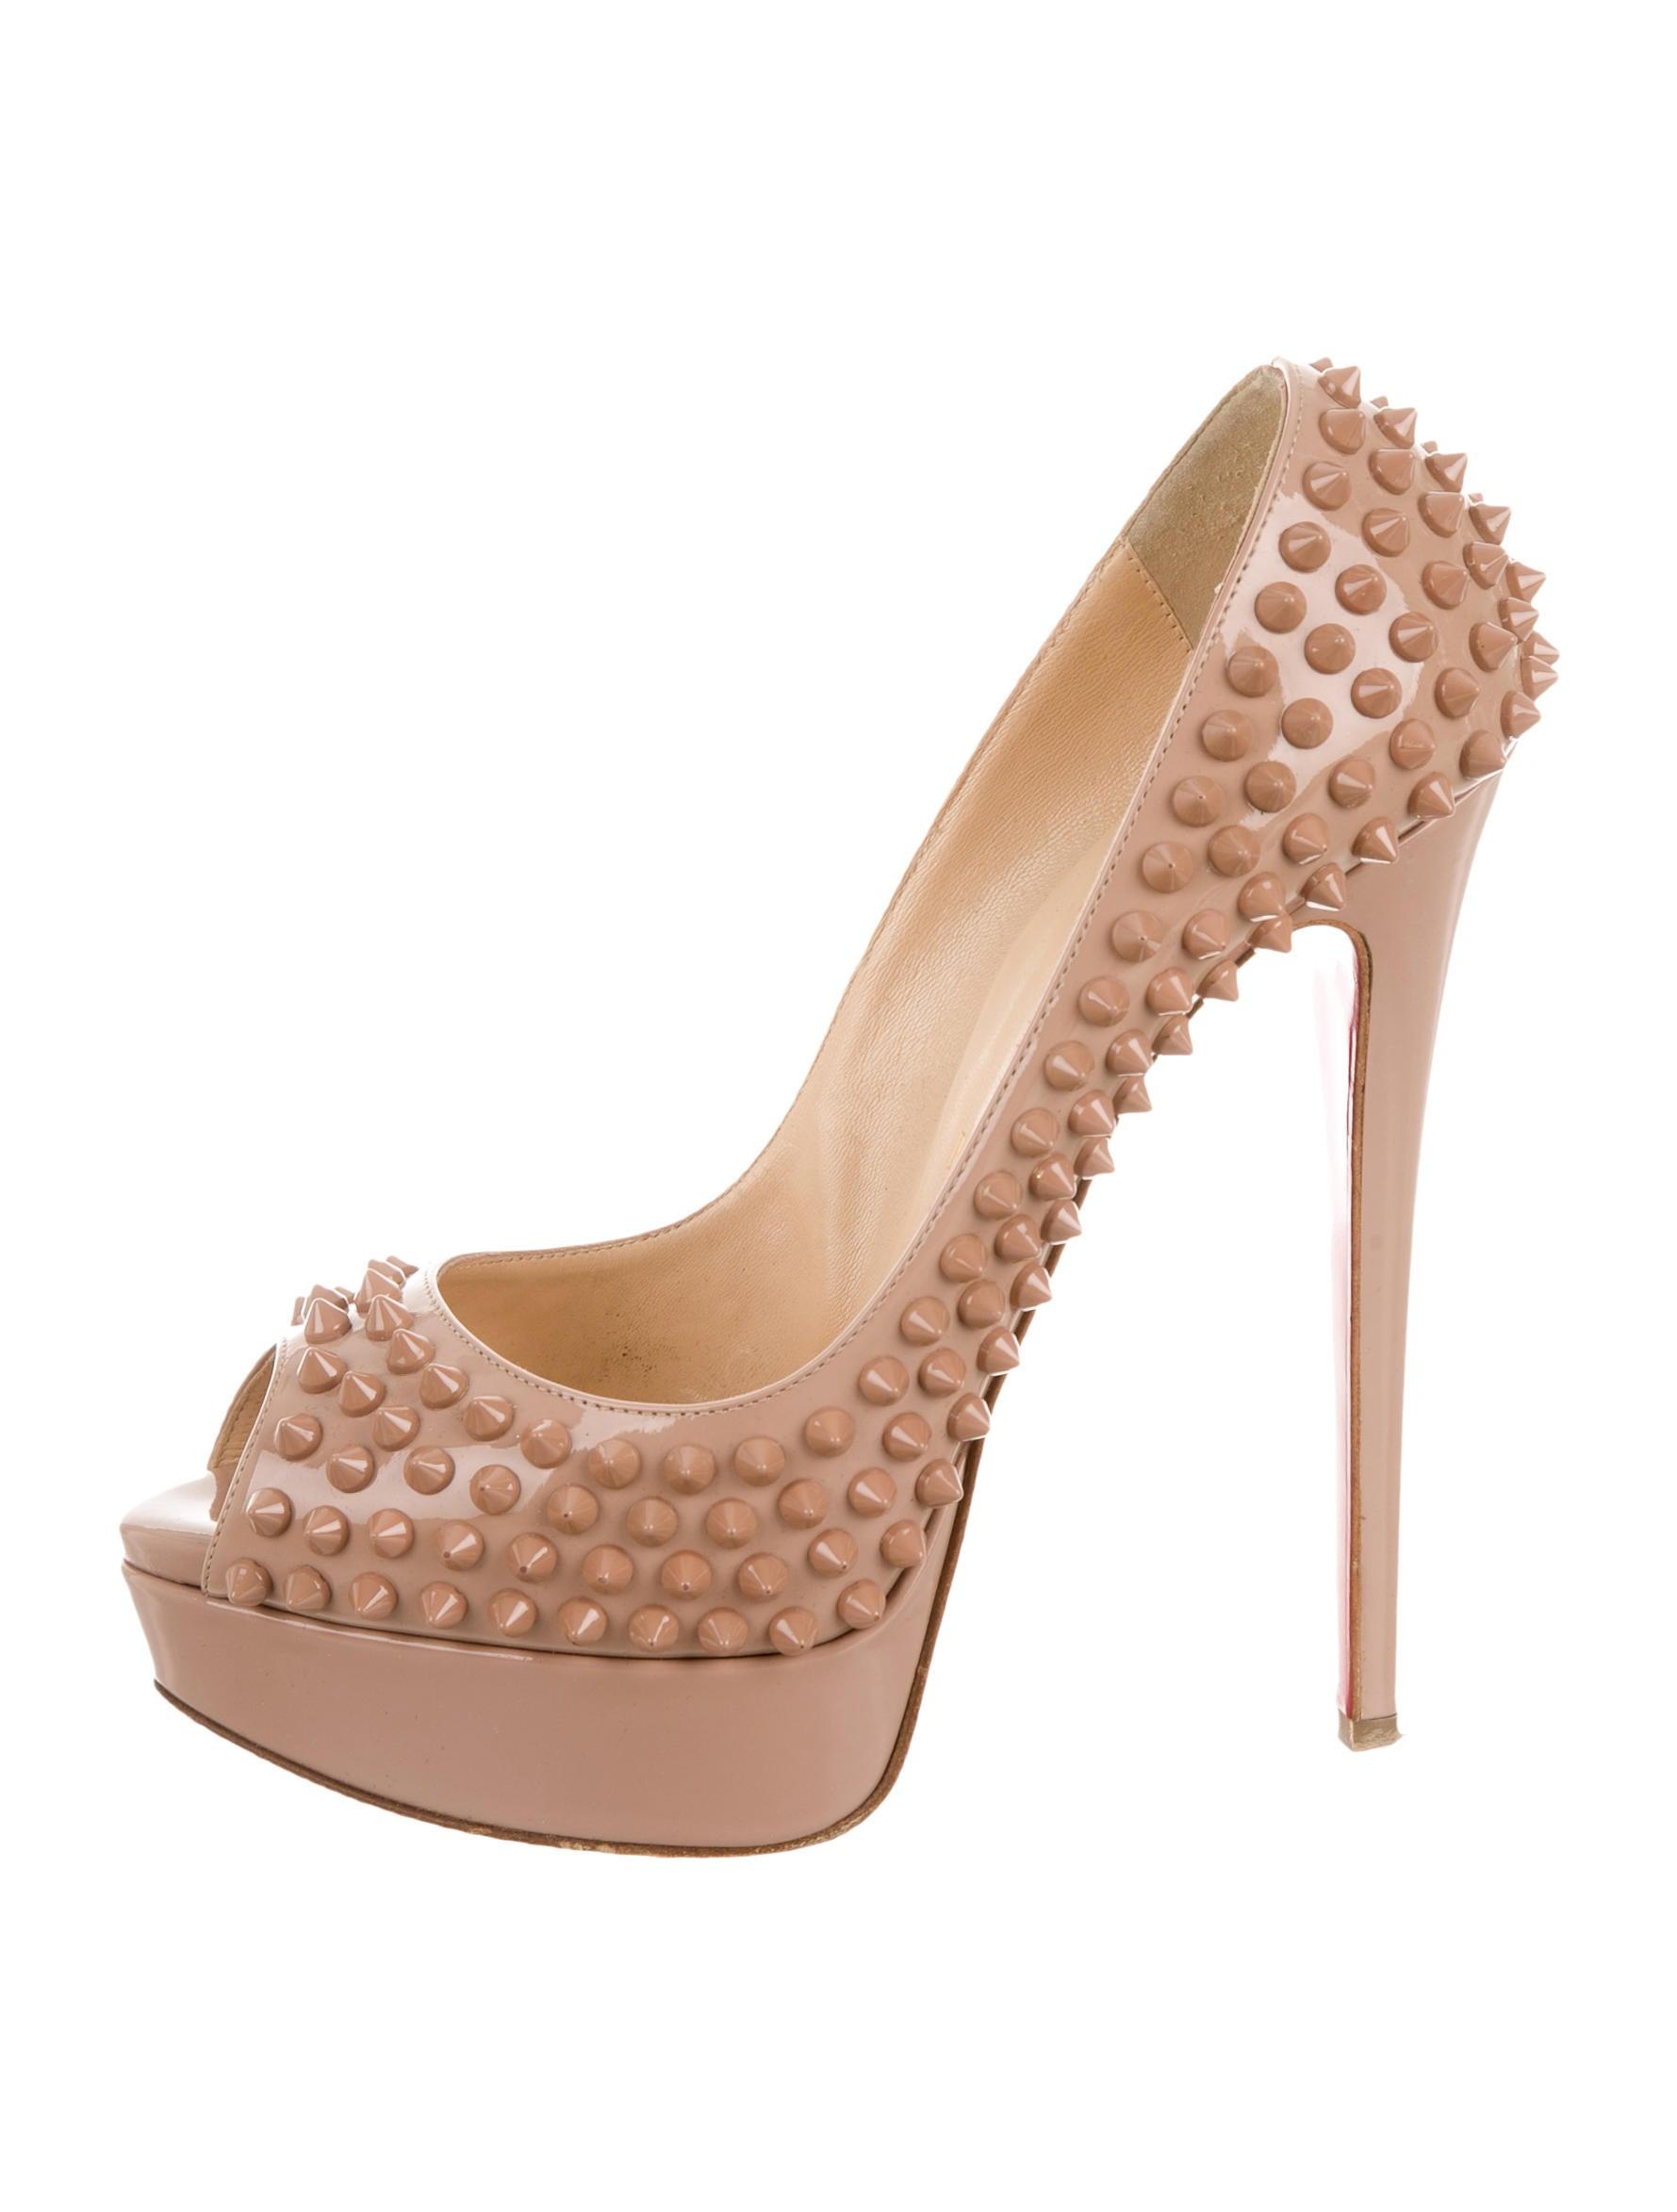 new styles c03db af065 Atlassian CrowdID - Christian Louboutin Cream Heels Quality ...